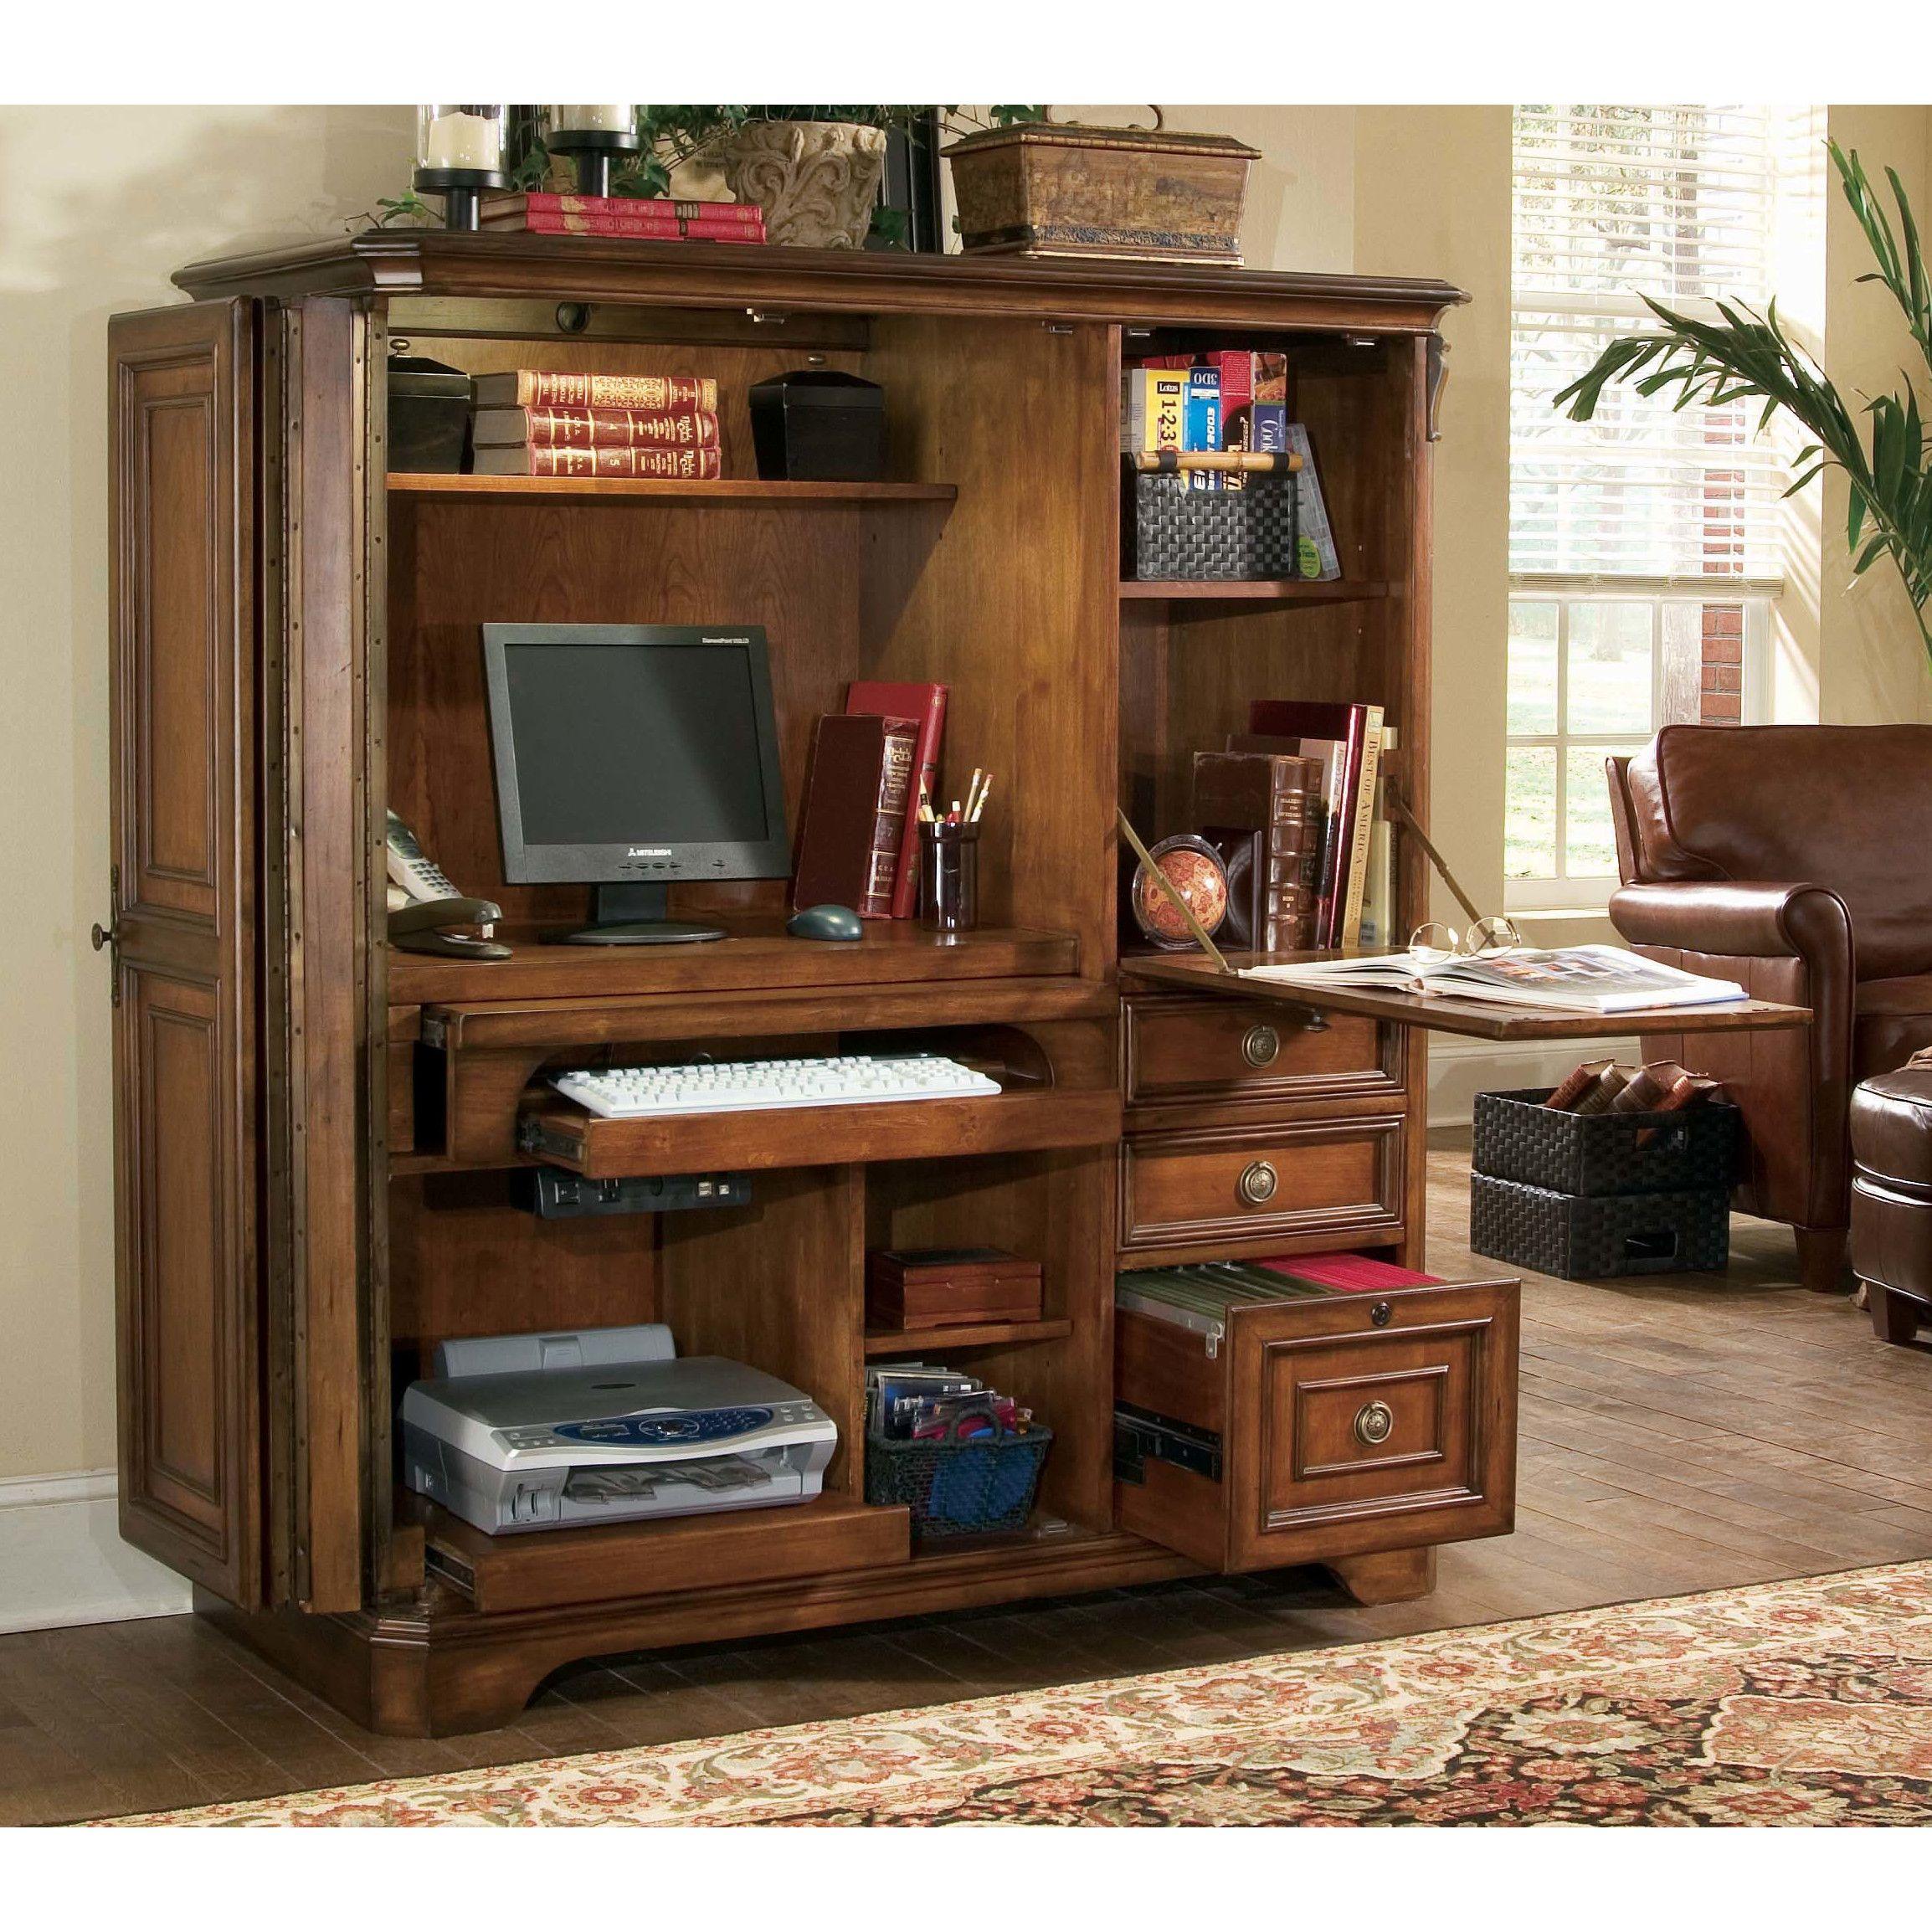 Hooker furniture brookhaven armoire desk reviews wayfair